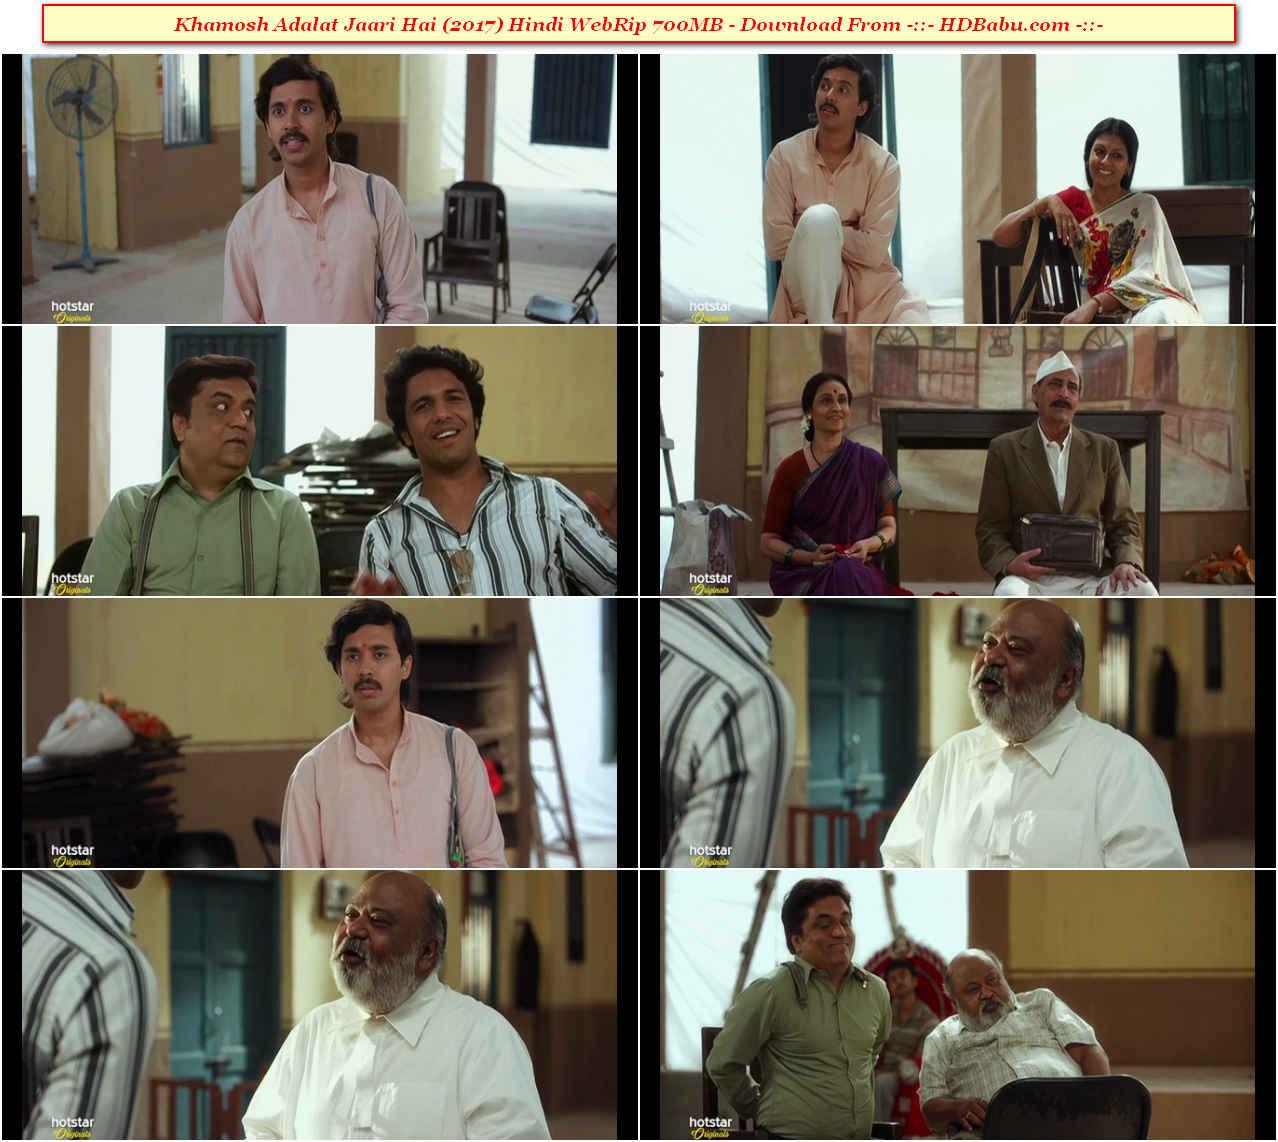 Khamosh Adalat Jaari Hai Full Movie Download